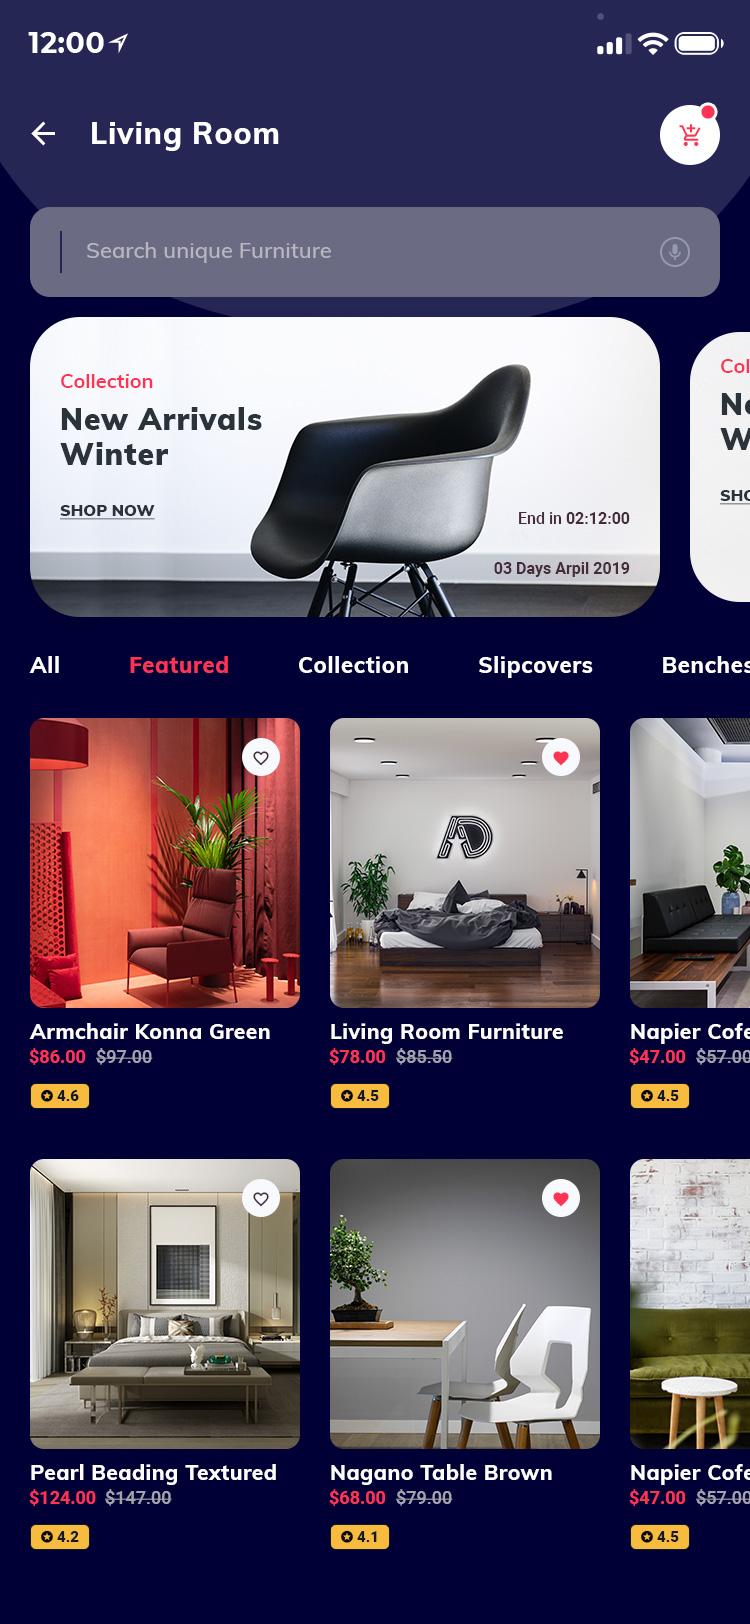 mobile-app-furniture-8